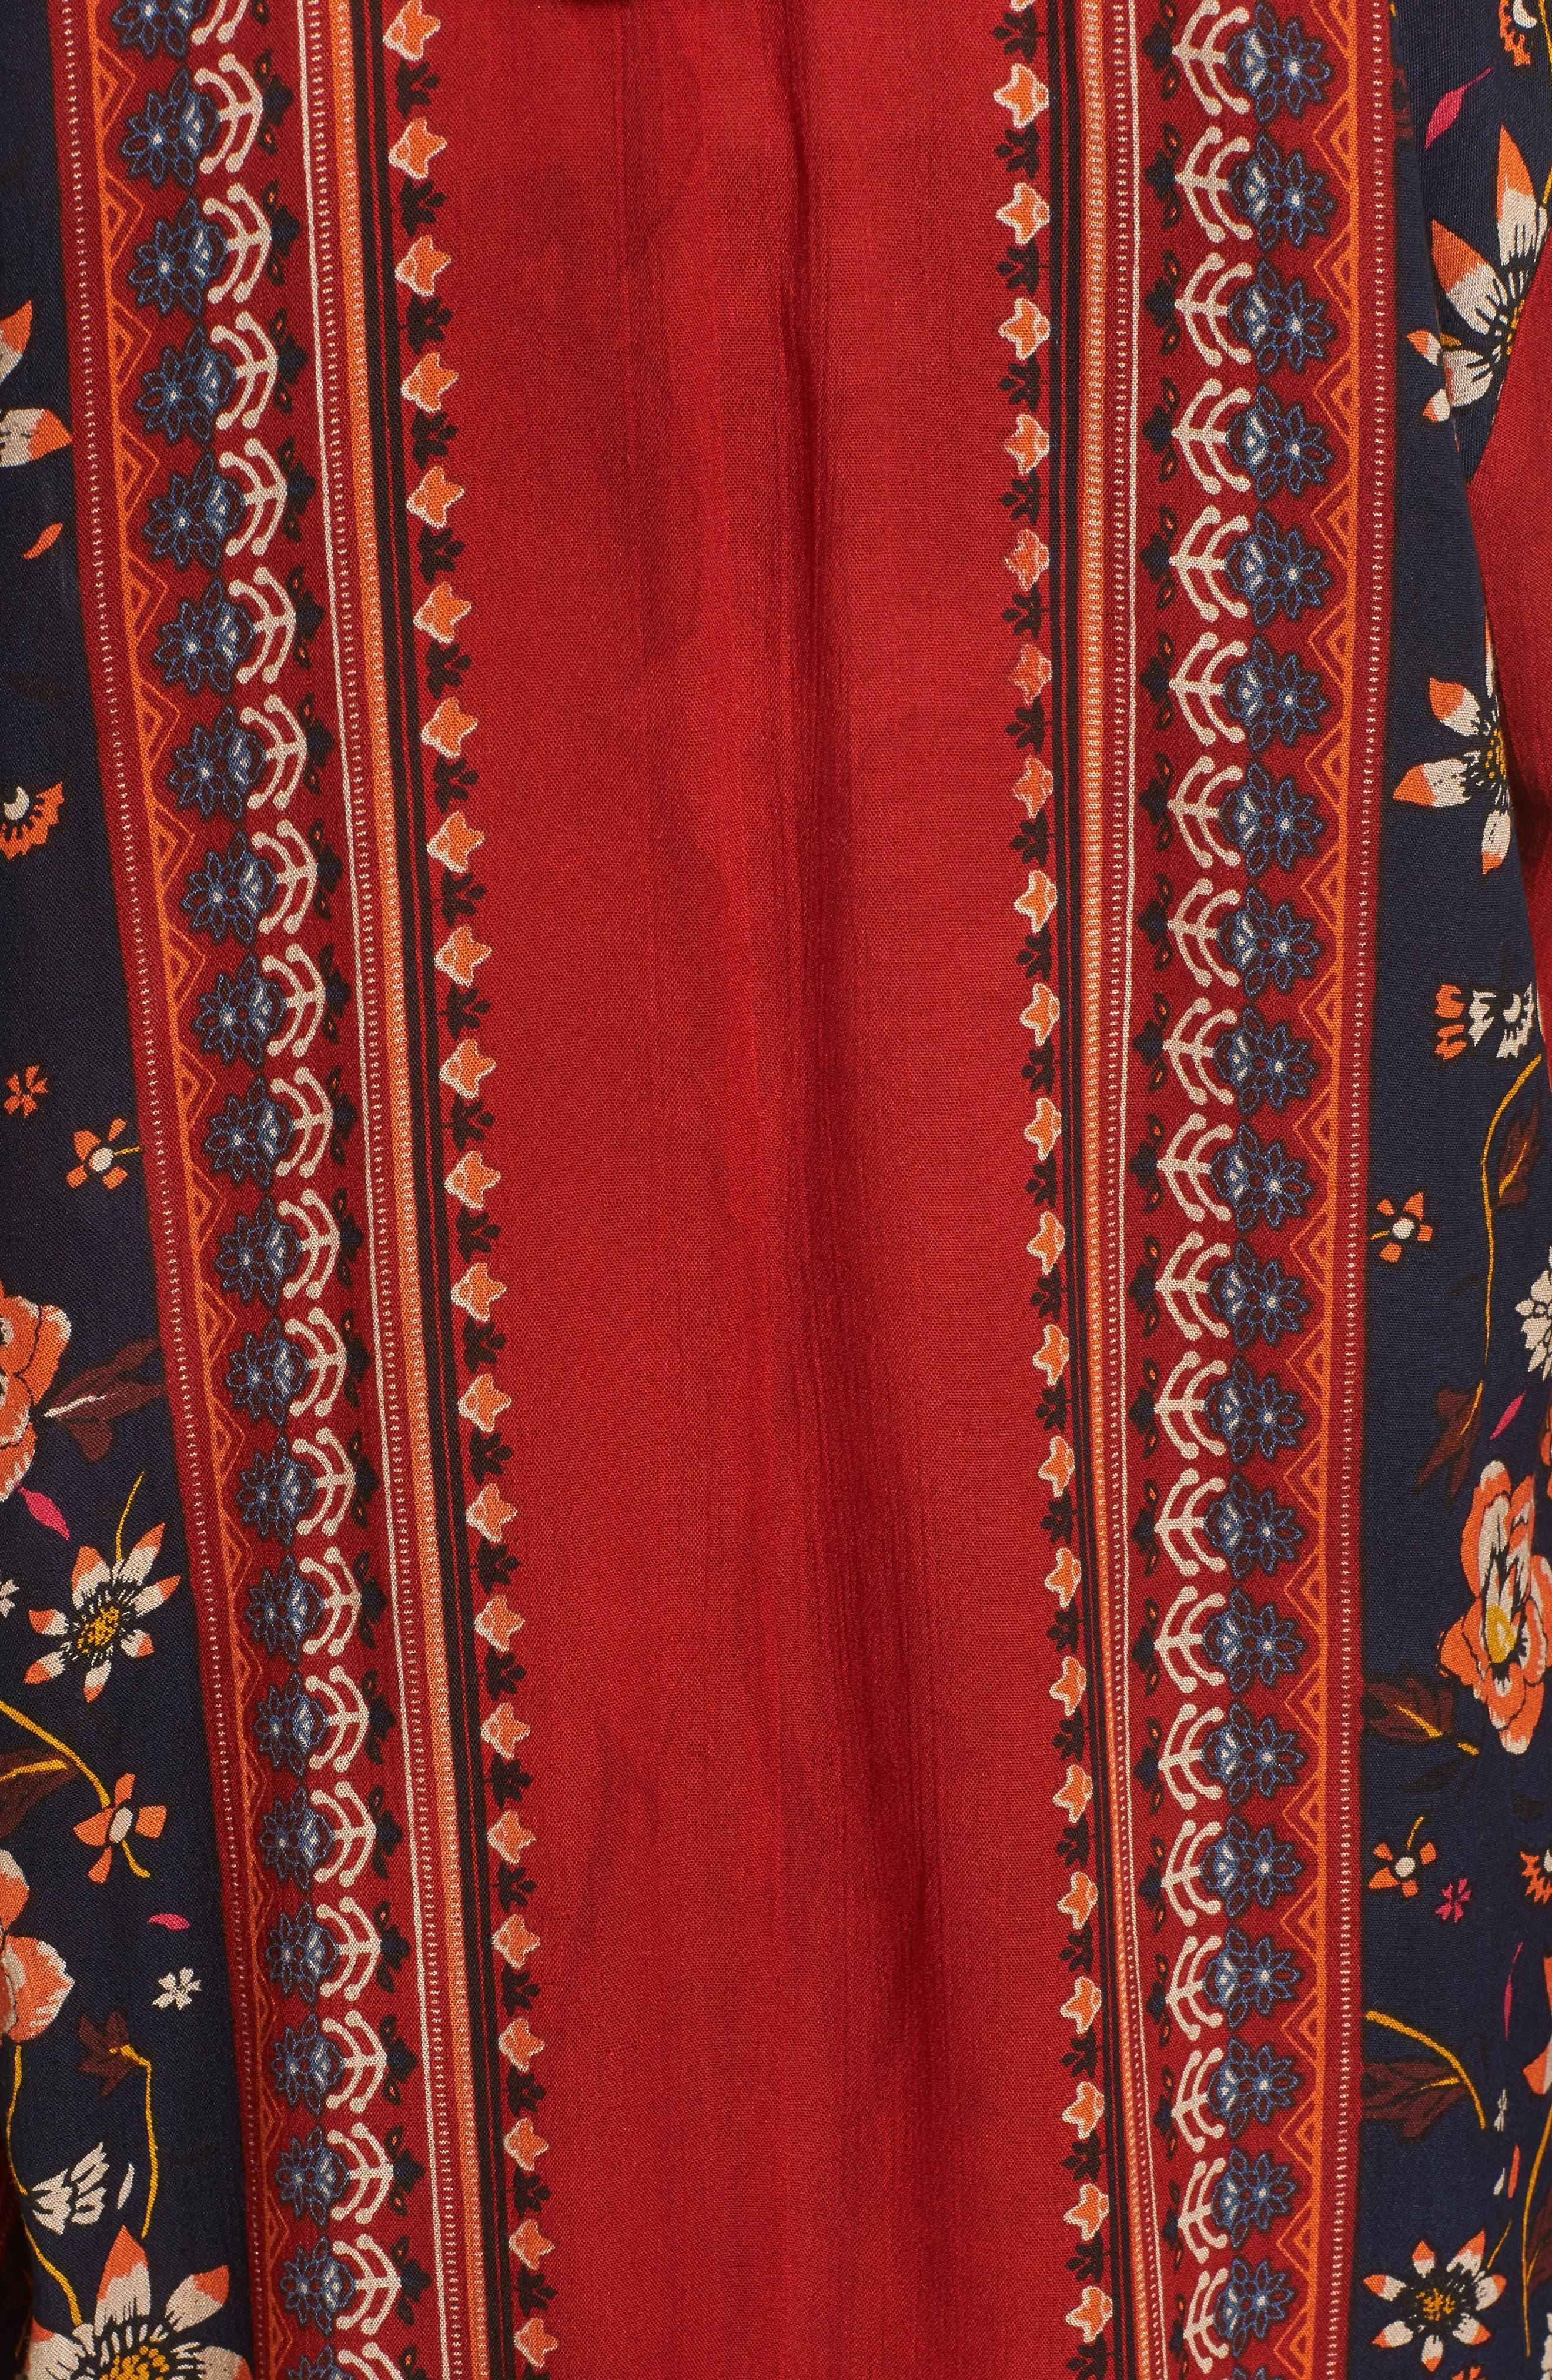 Bell Sleeve Kimono,                             Alternate thumbnail 5, color,                             Rust/ Navy